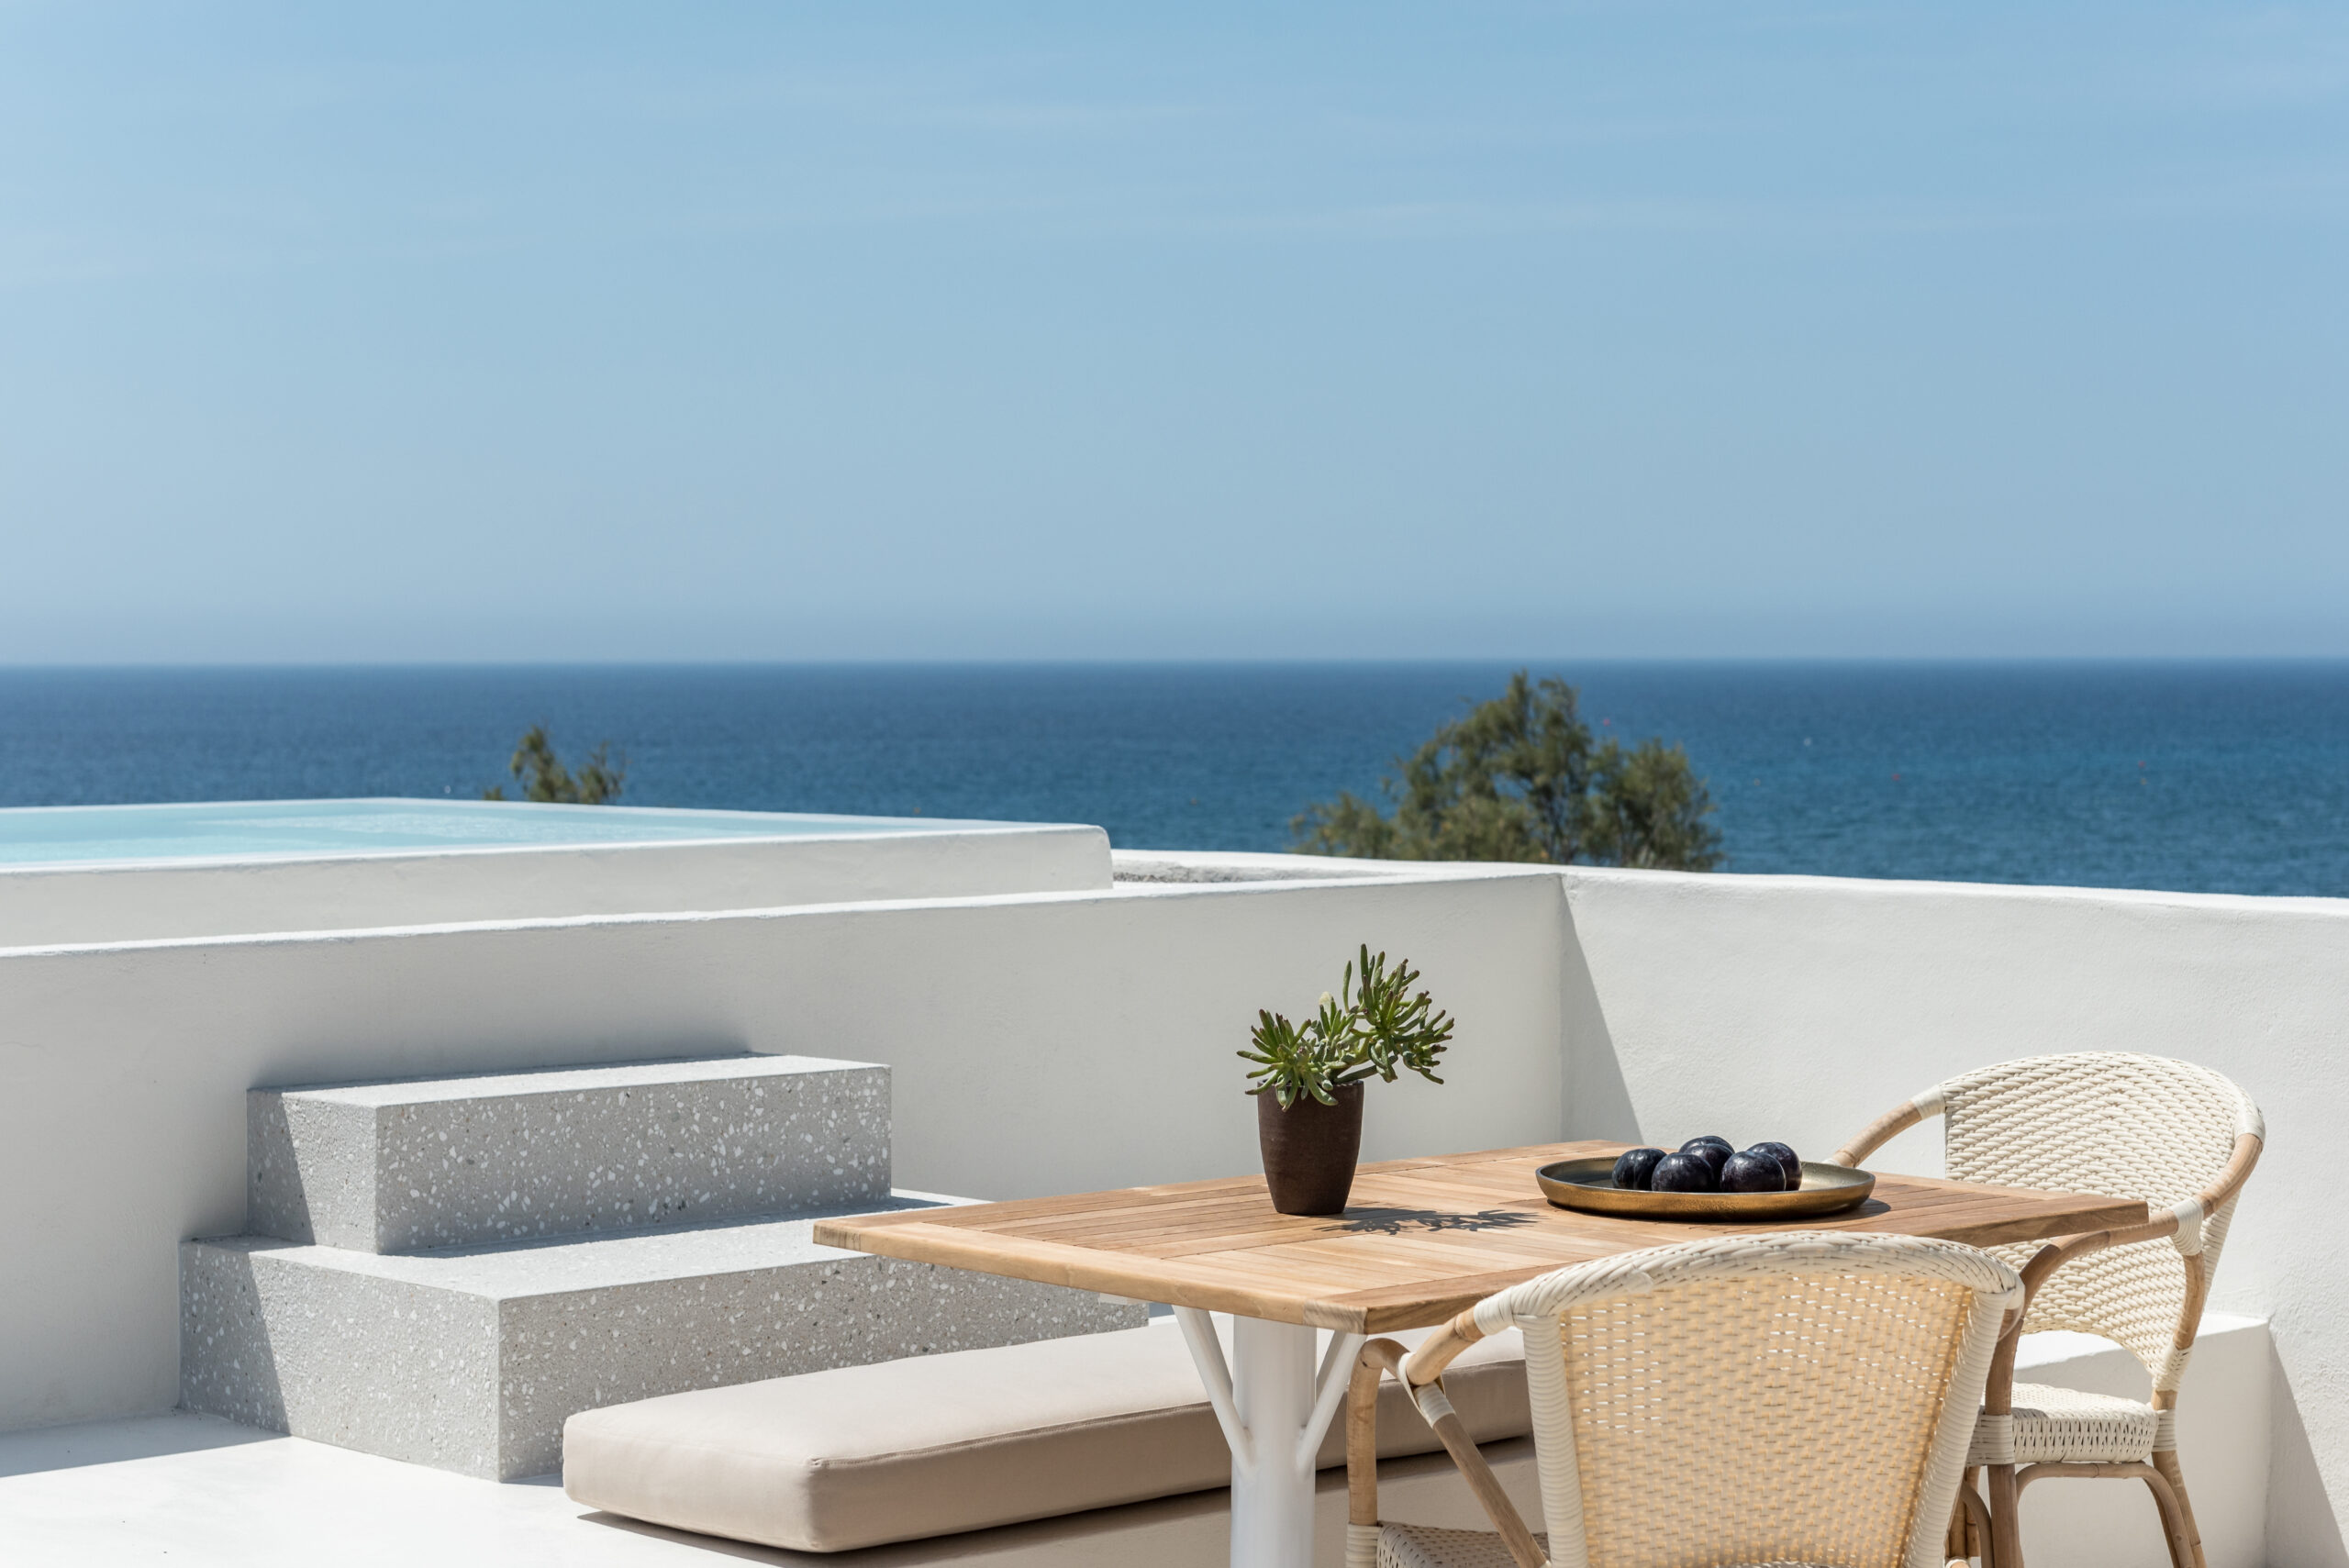 suite Istoria hotel Santorini Greece luxury villa design outdoor pool hot tub